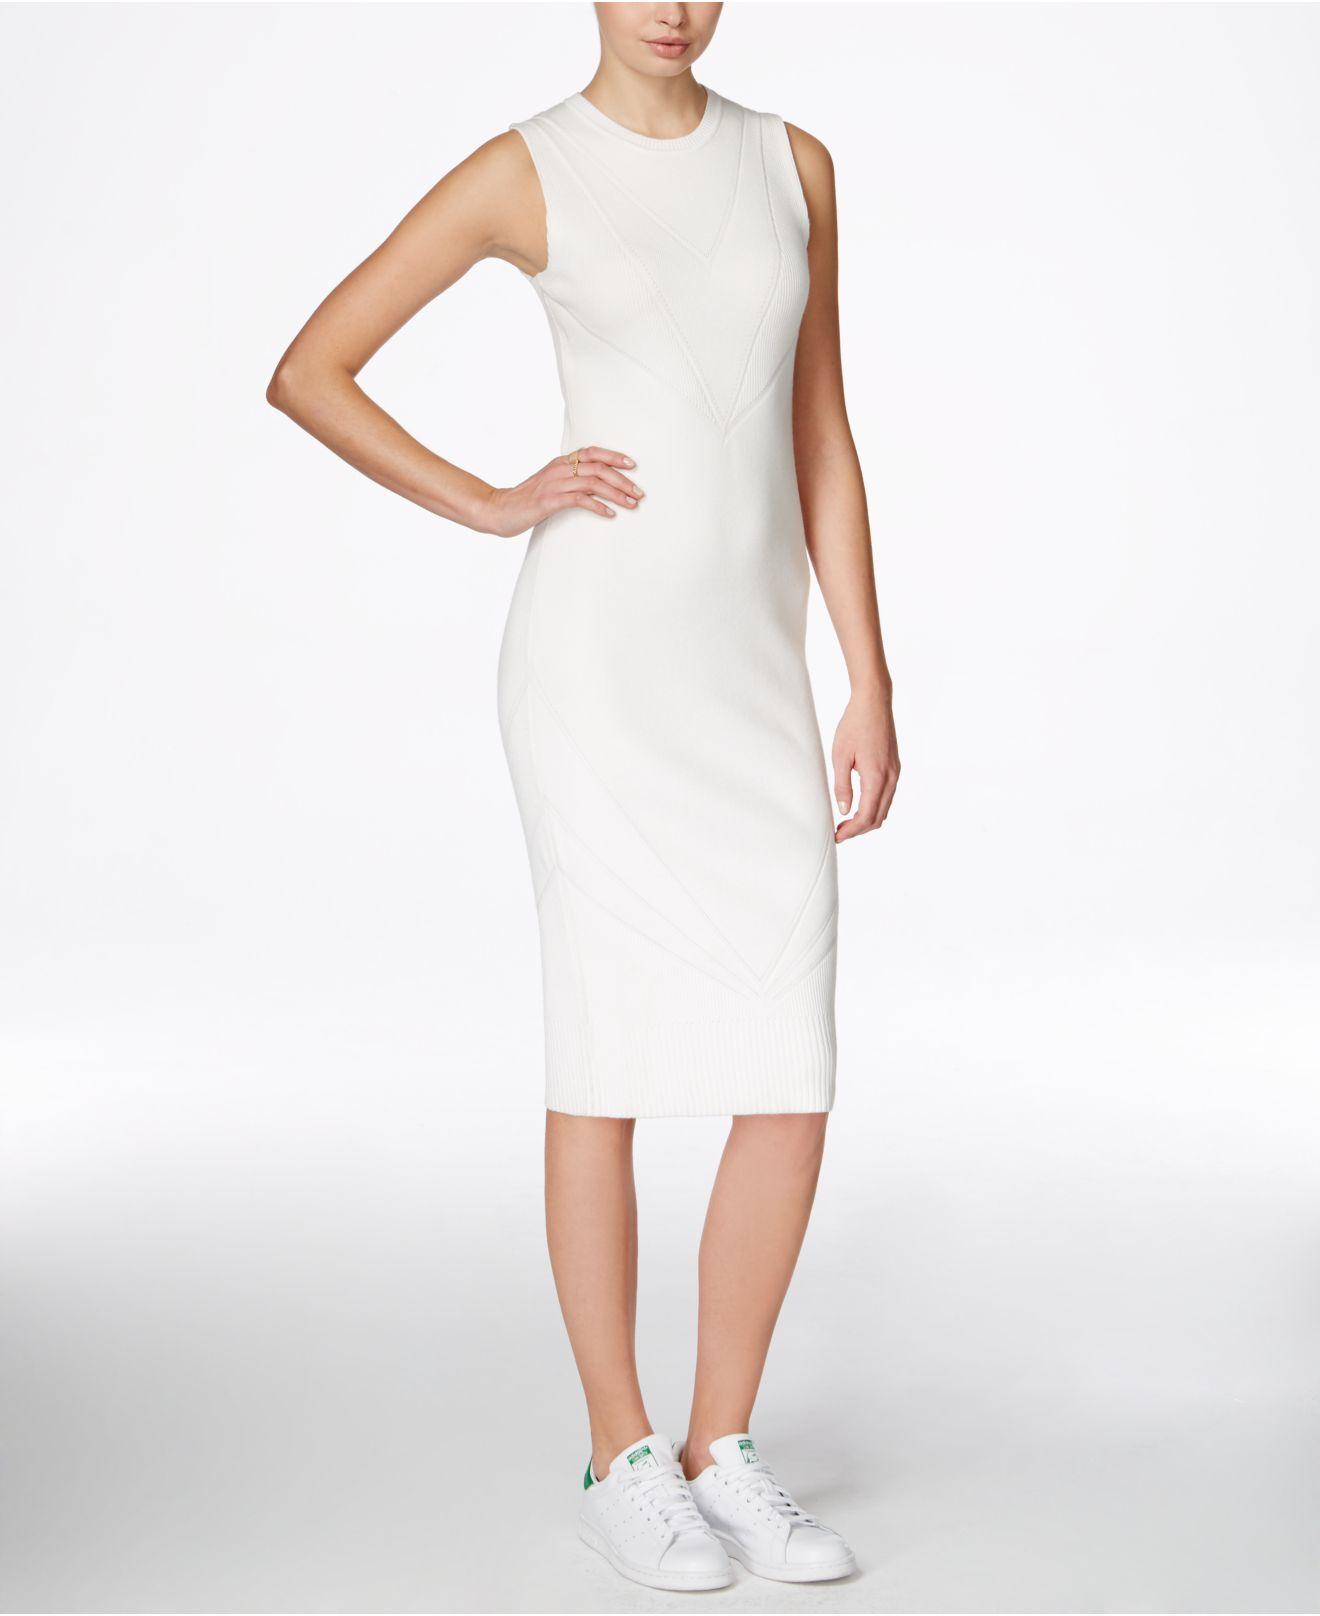 5f3ba6b3c20 Lyst - RACHEL Rachel Roy Midi Sweater Dress in White